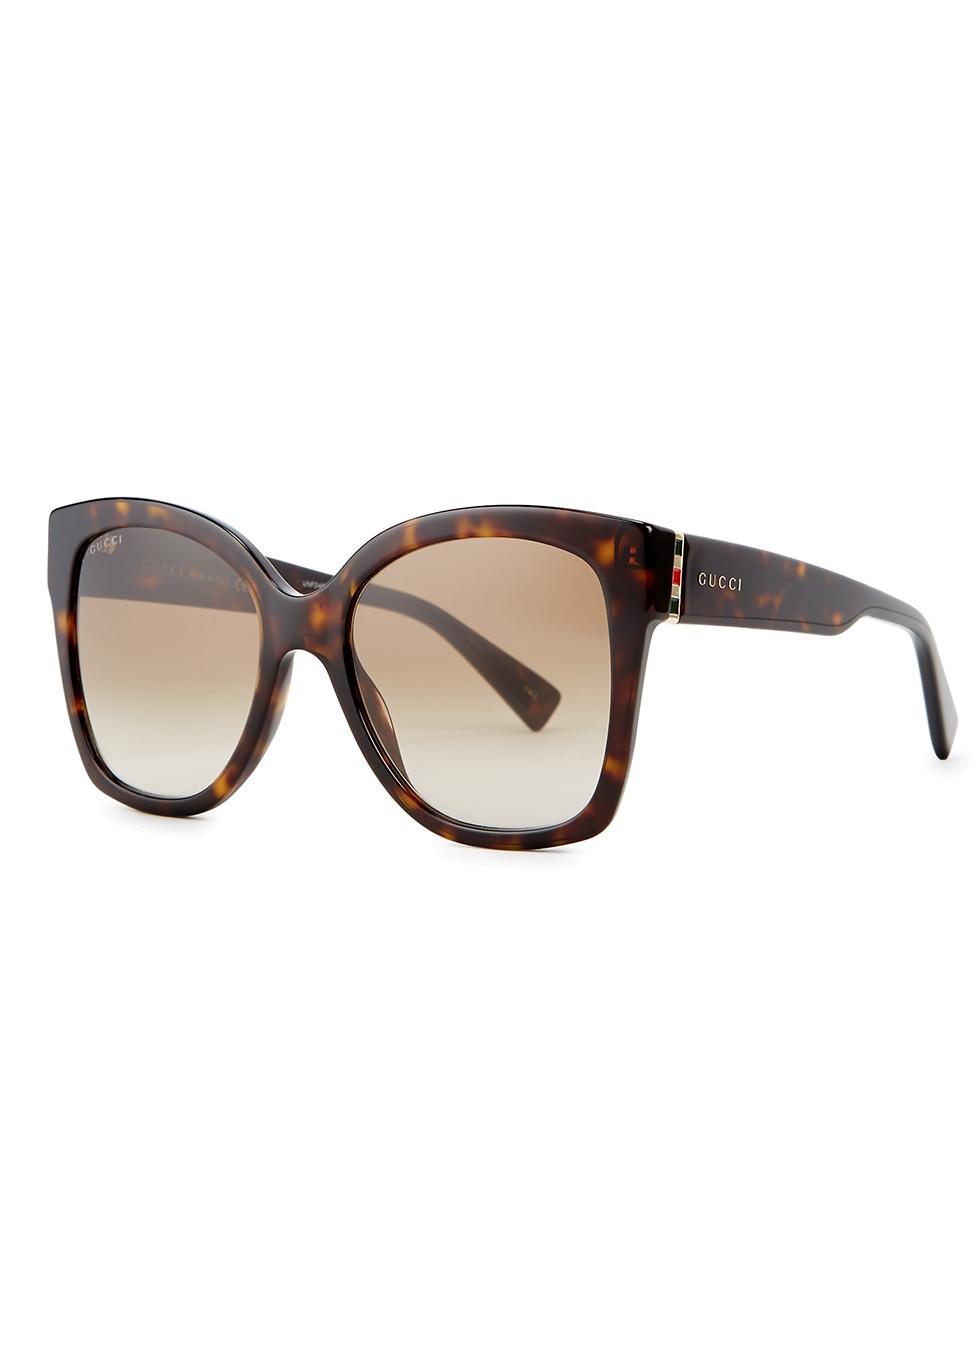 6cb11063b0 Women s Designer Sunglasses and Eyewear - Harvey Nichols